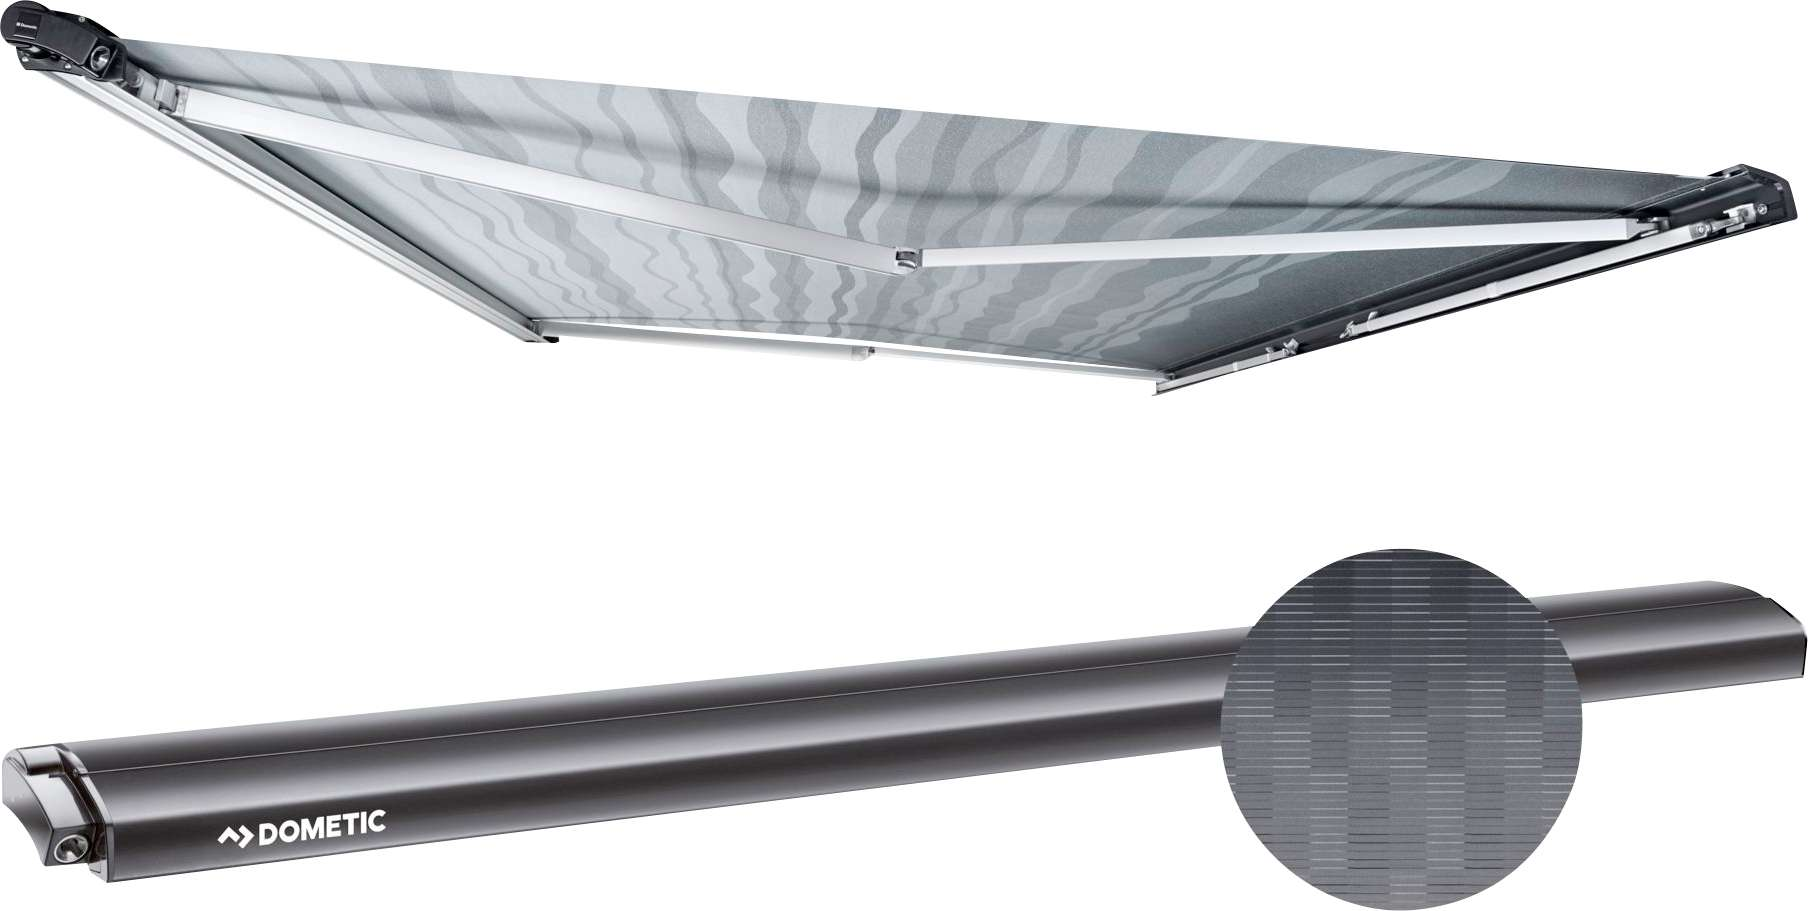 Dometic Dachmarkisenpaket PerfectRoof PR 2000 Kit Fiat Ducato | 05420077041020